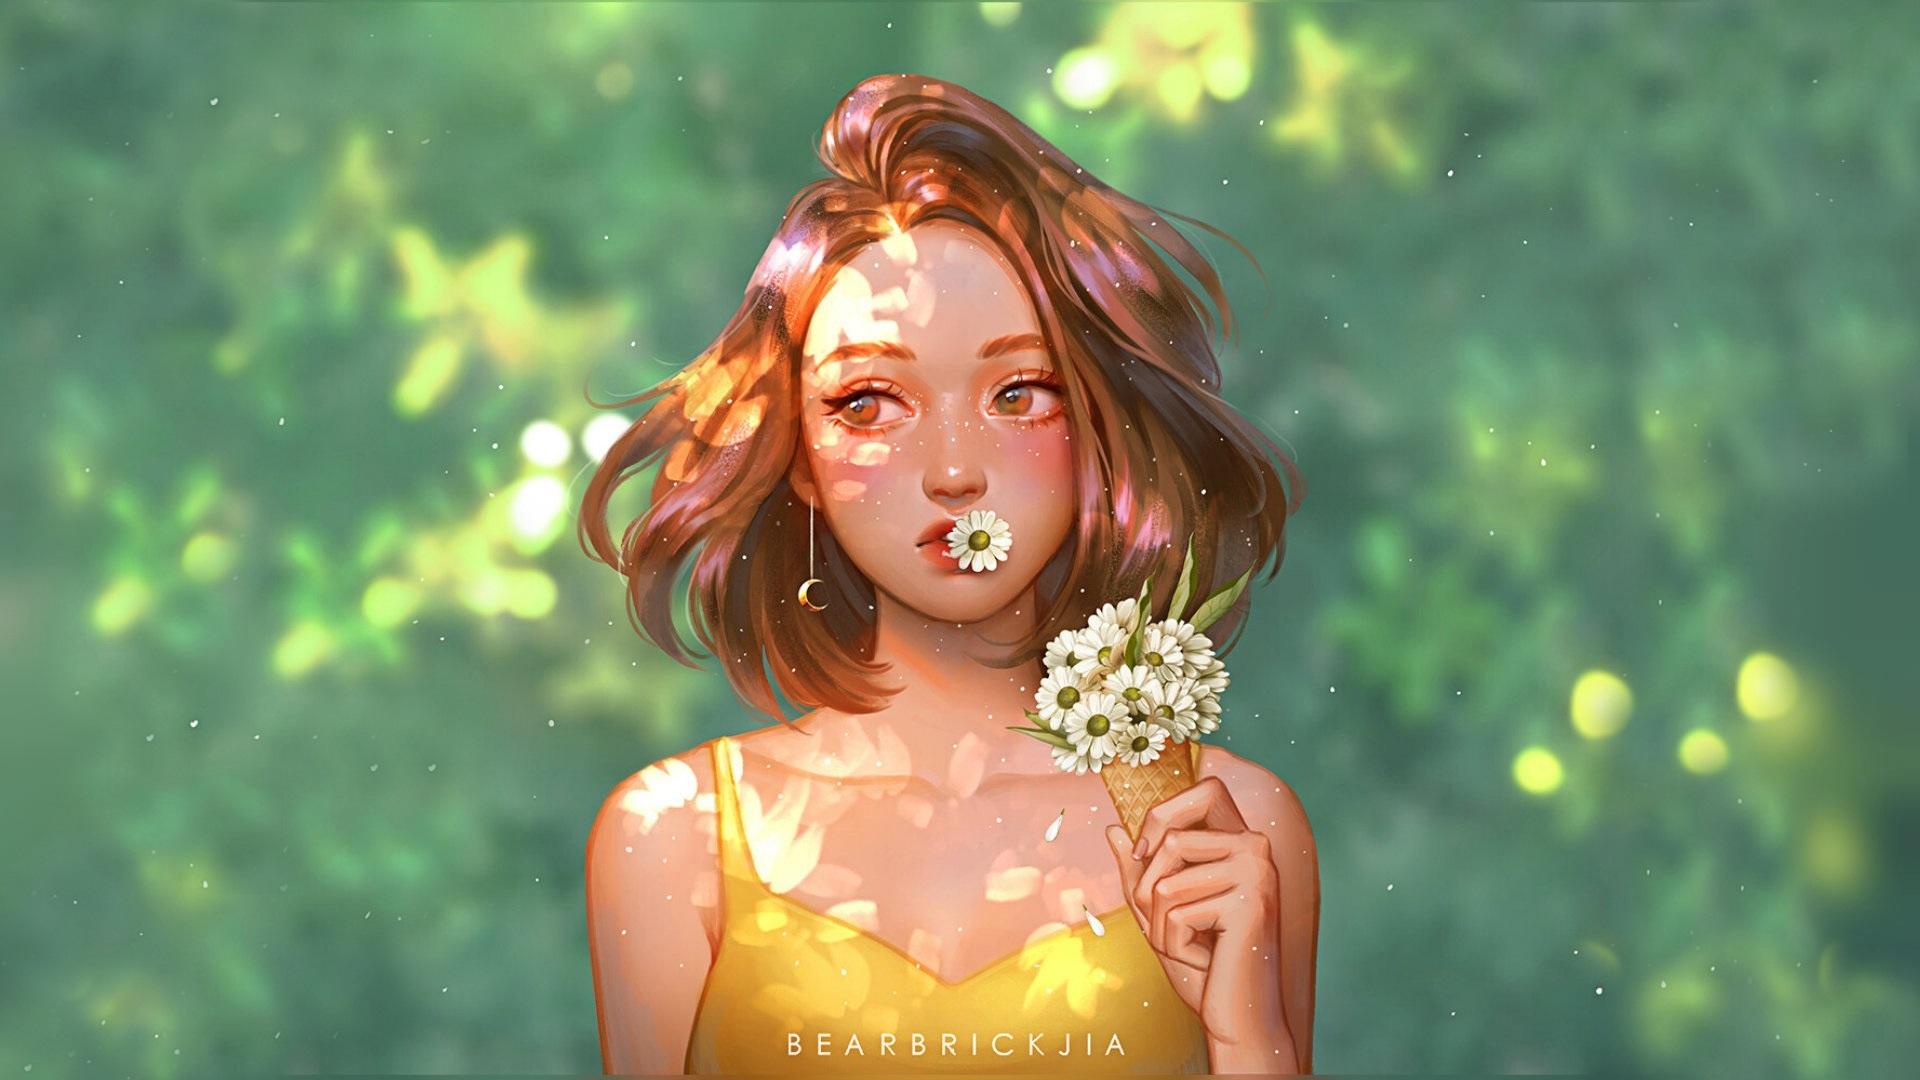 General 1920x1080 digital art fantasy girl flowers green Karmen Loh women illustration daisies